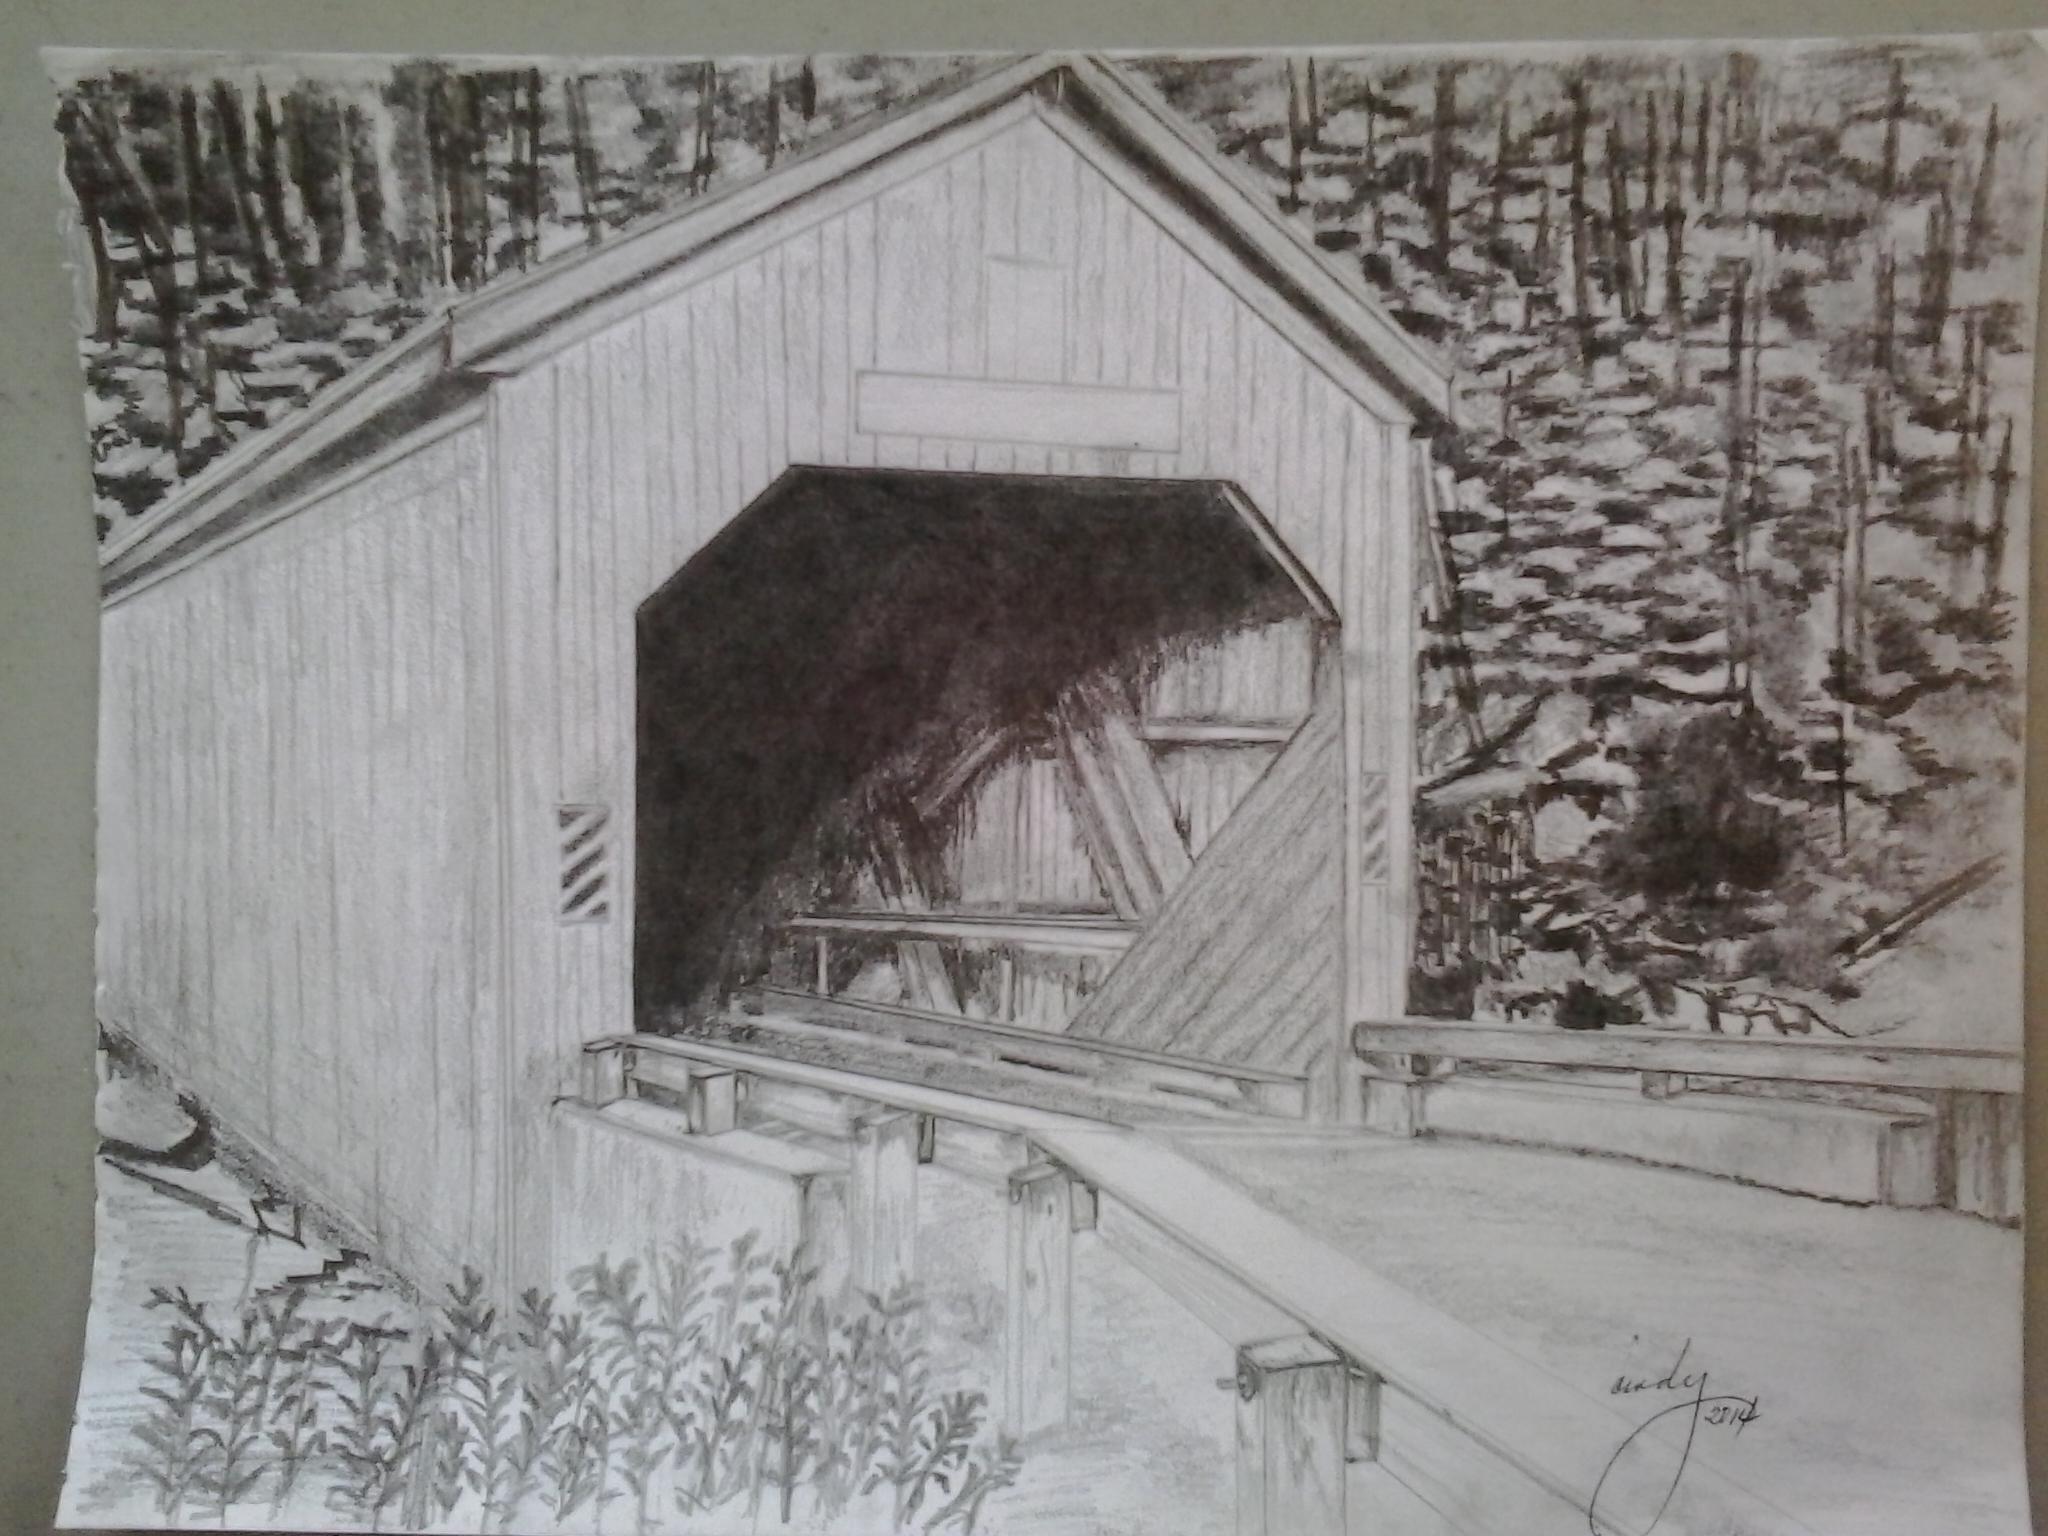 Covered bridge pencil sketch